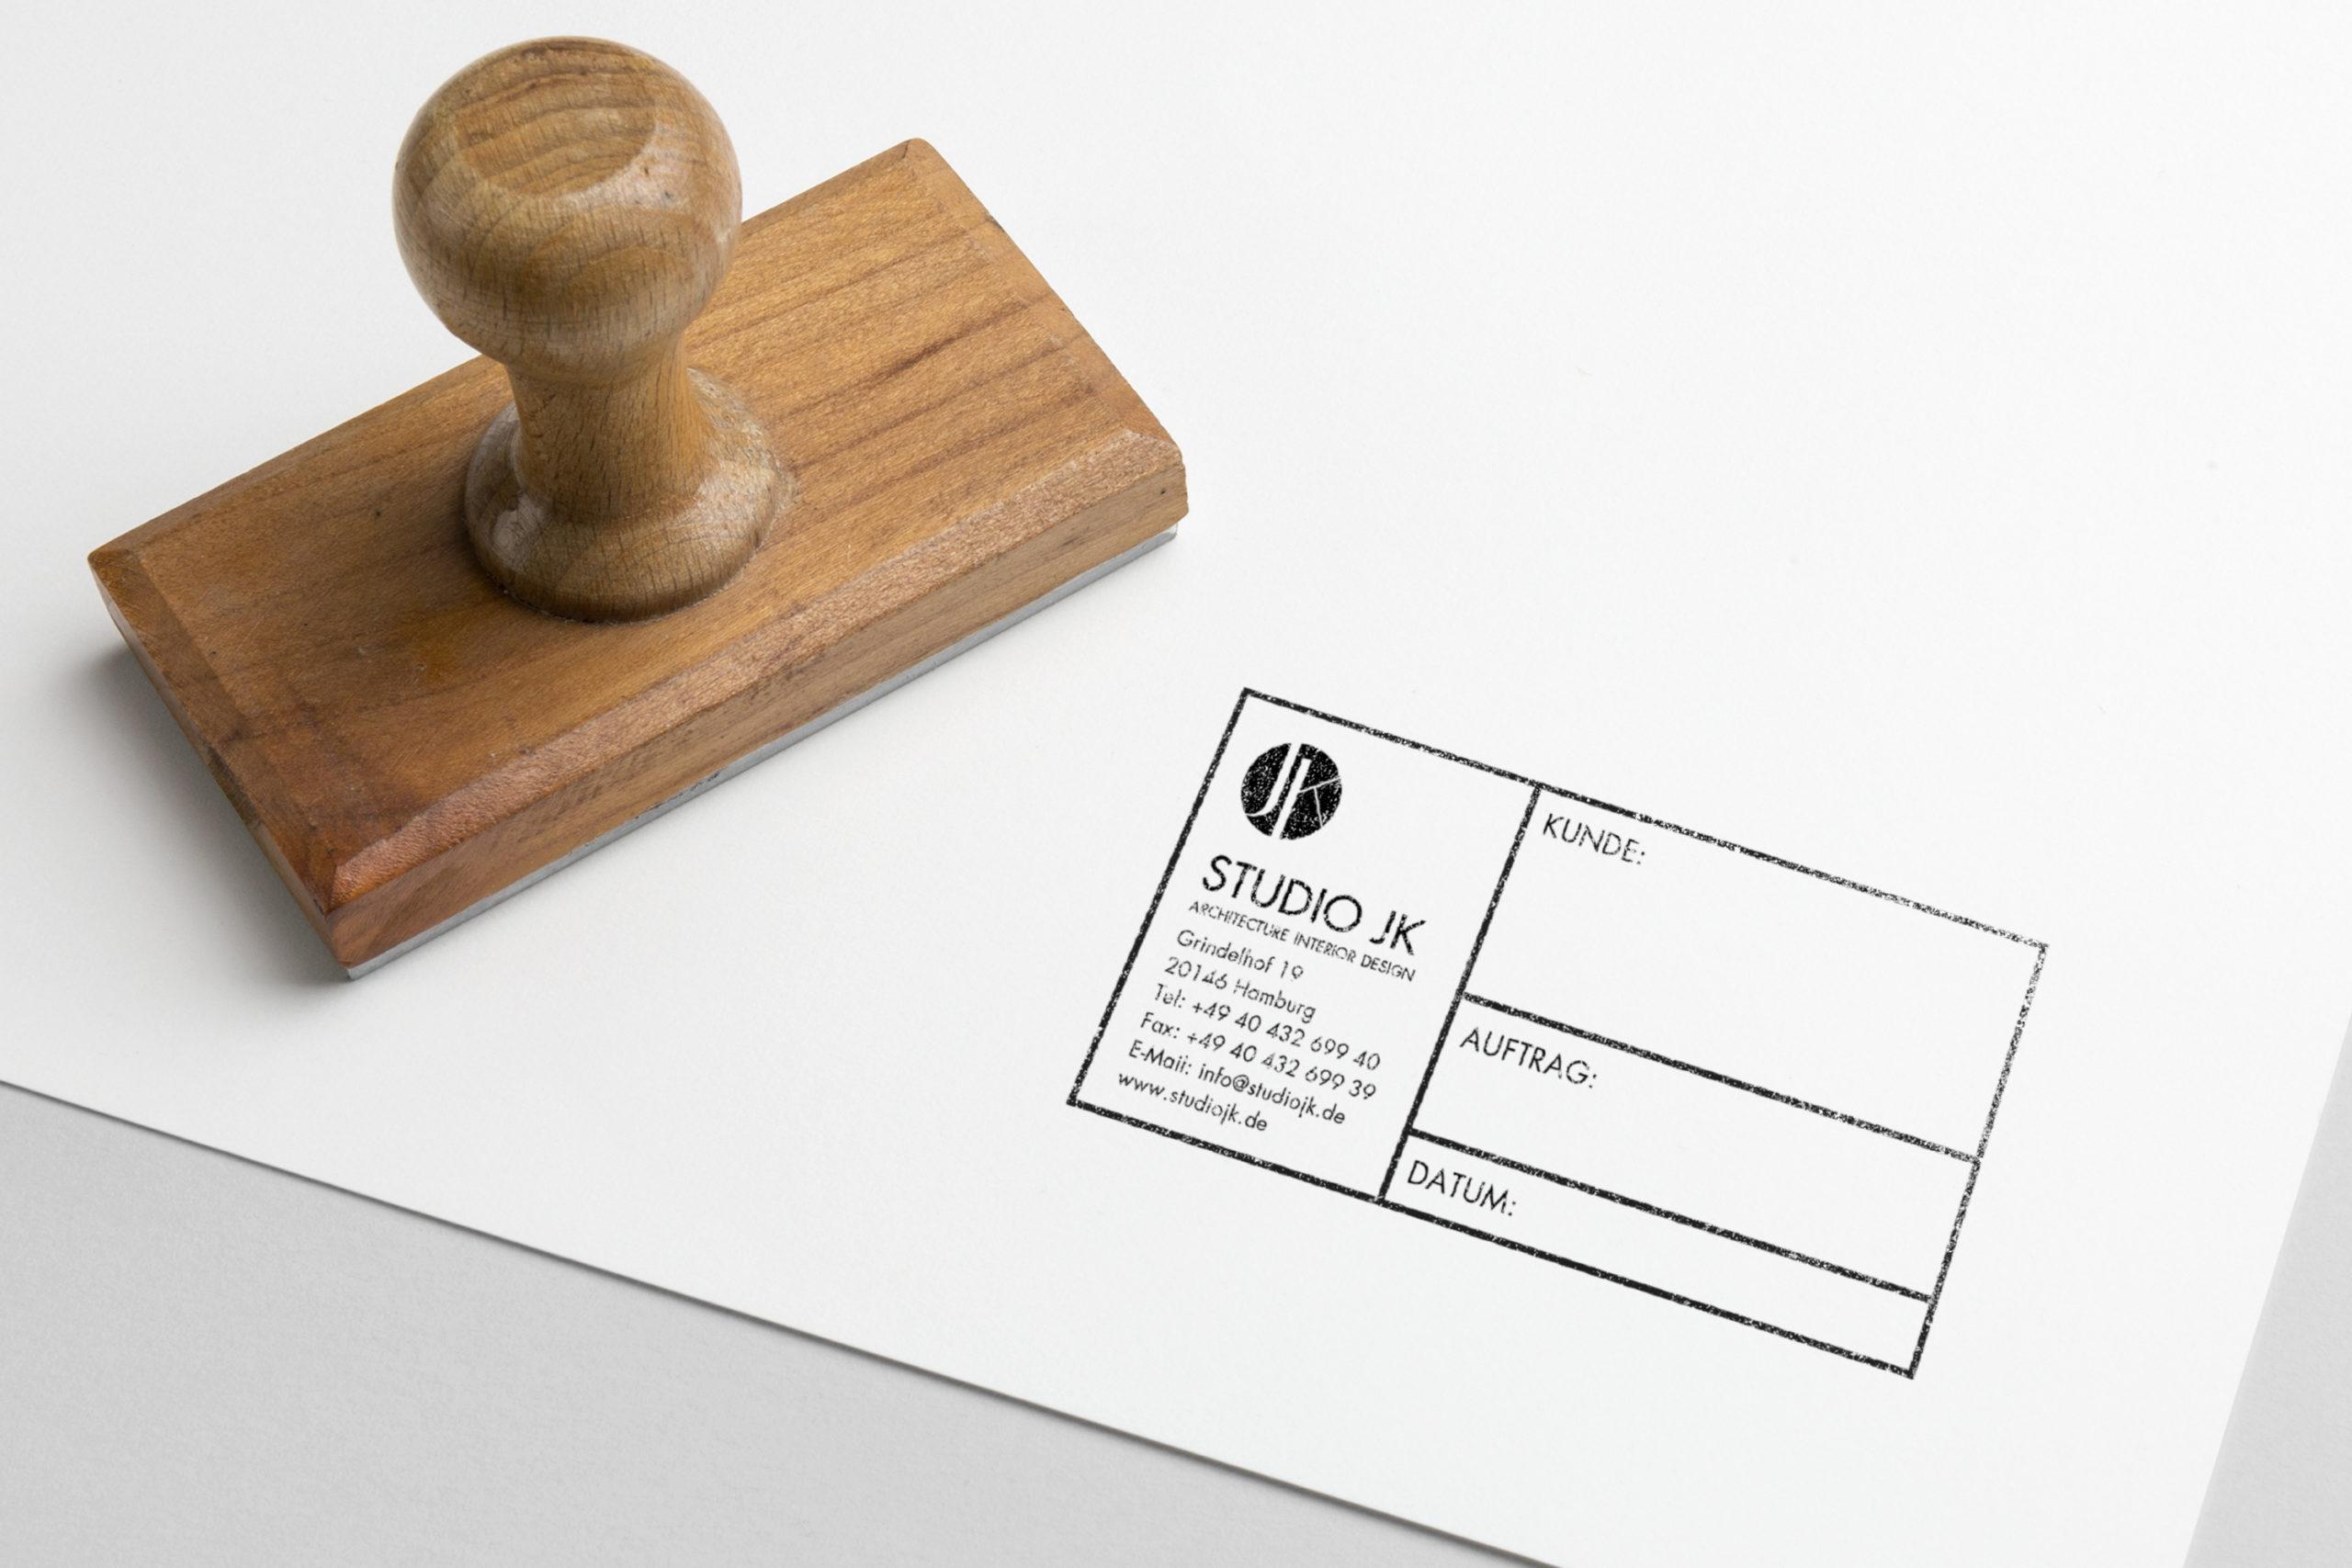 StudioJK | Architecture Interior Design / Stamp